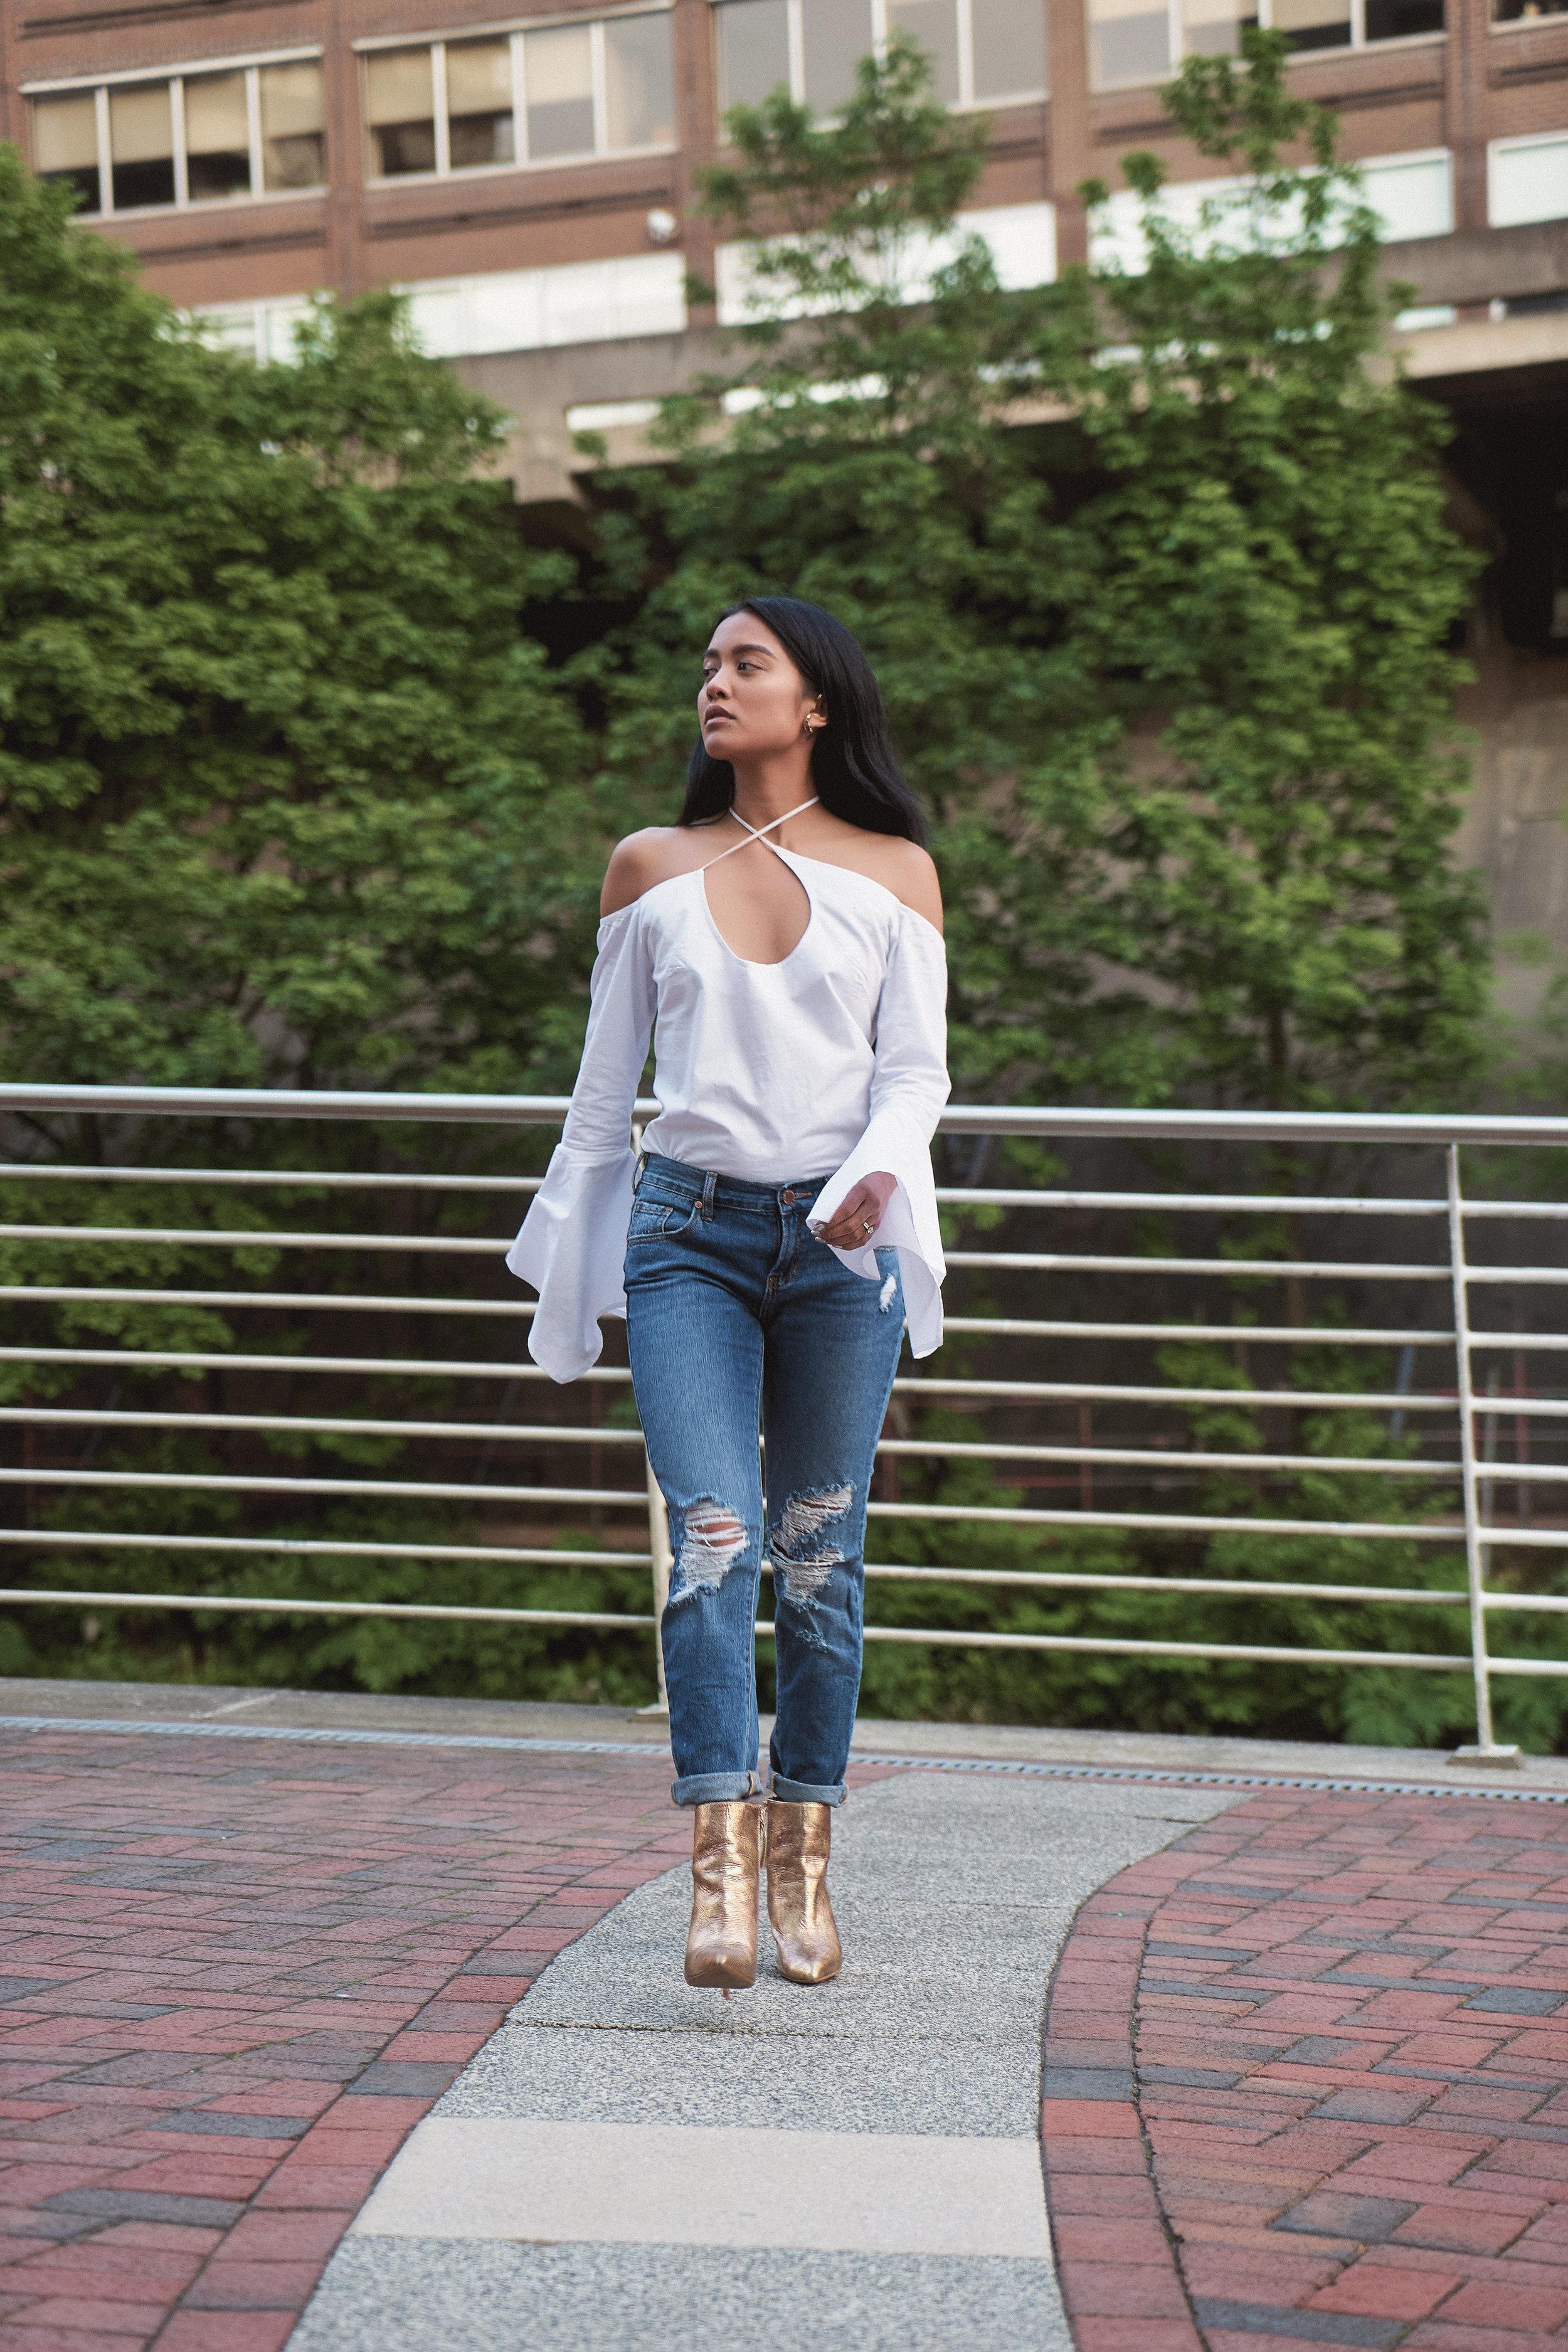 maurie & eve top  |  pacsun jeans  | zara booties |  love AJ earrings |  TT ring  |   photos by sean martin